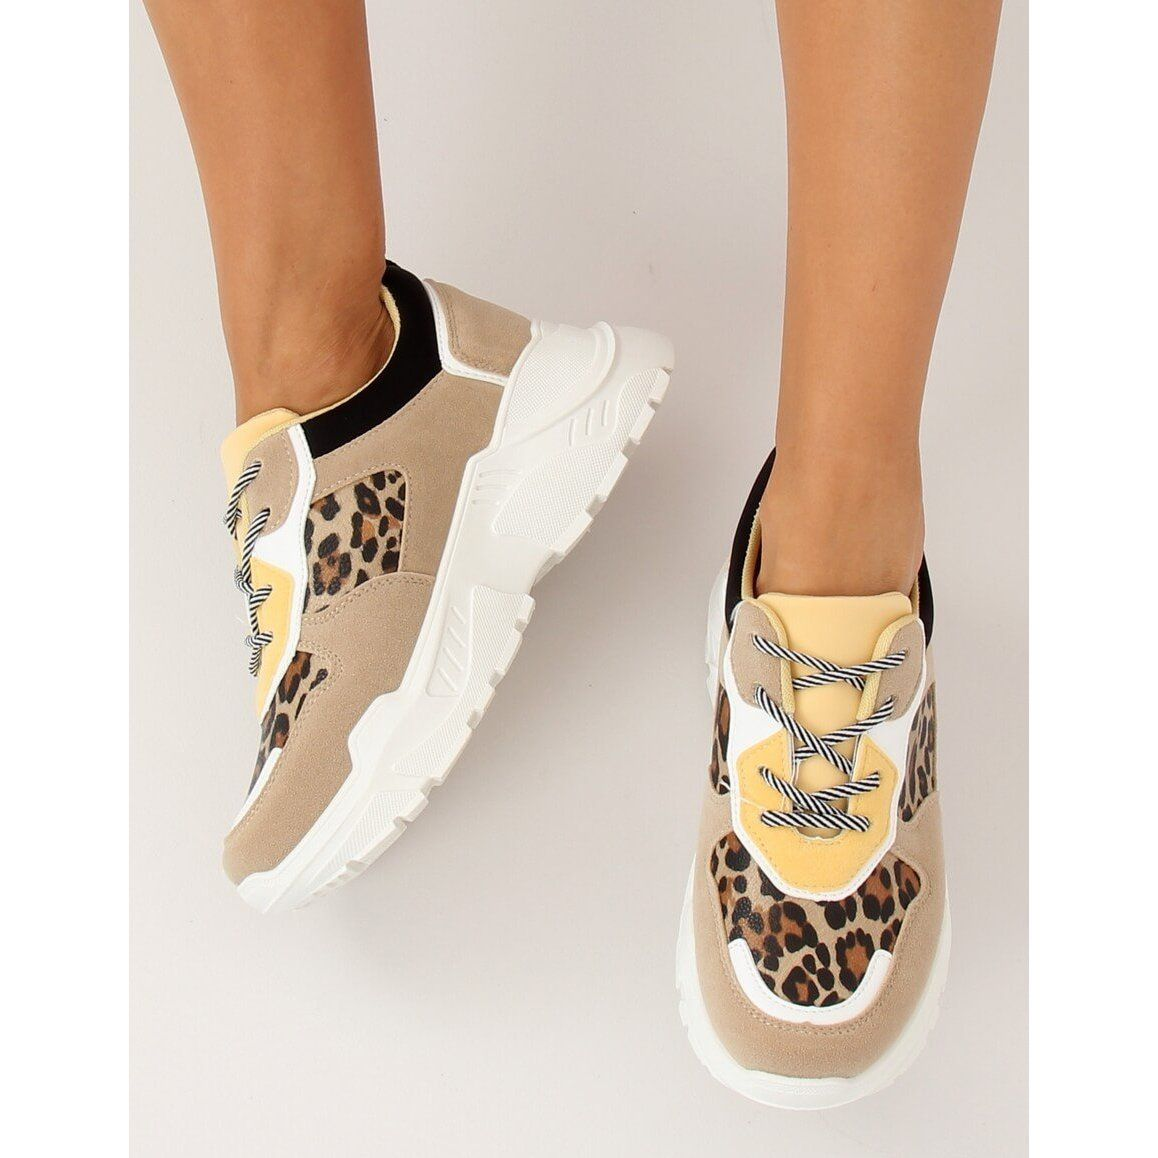 Buty Sportowe Bezowe Lv88p Leopard Bezowy Shoes Lace Heels Sports Shoes